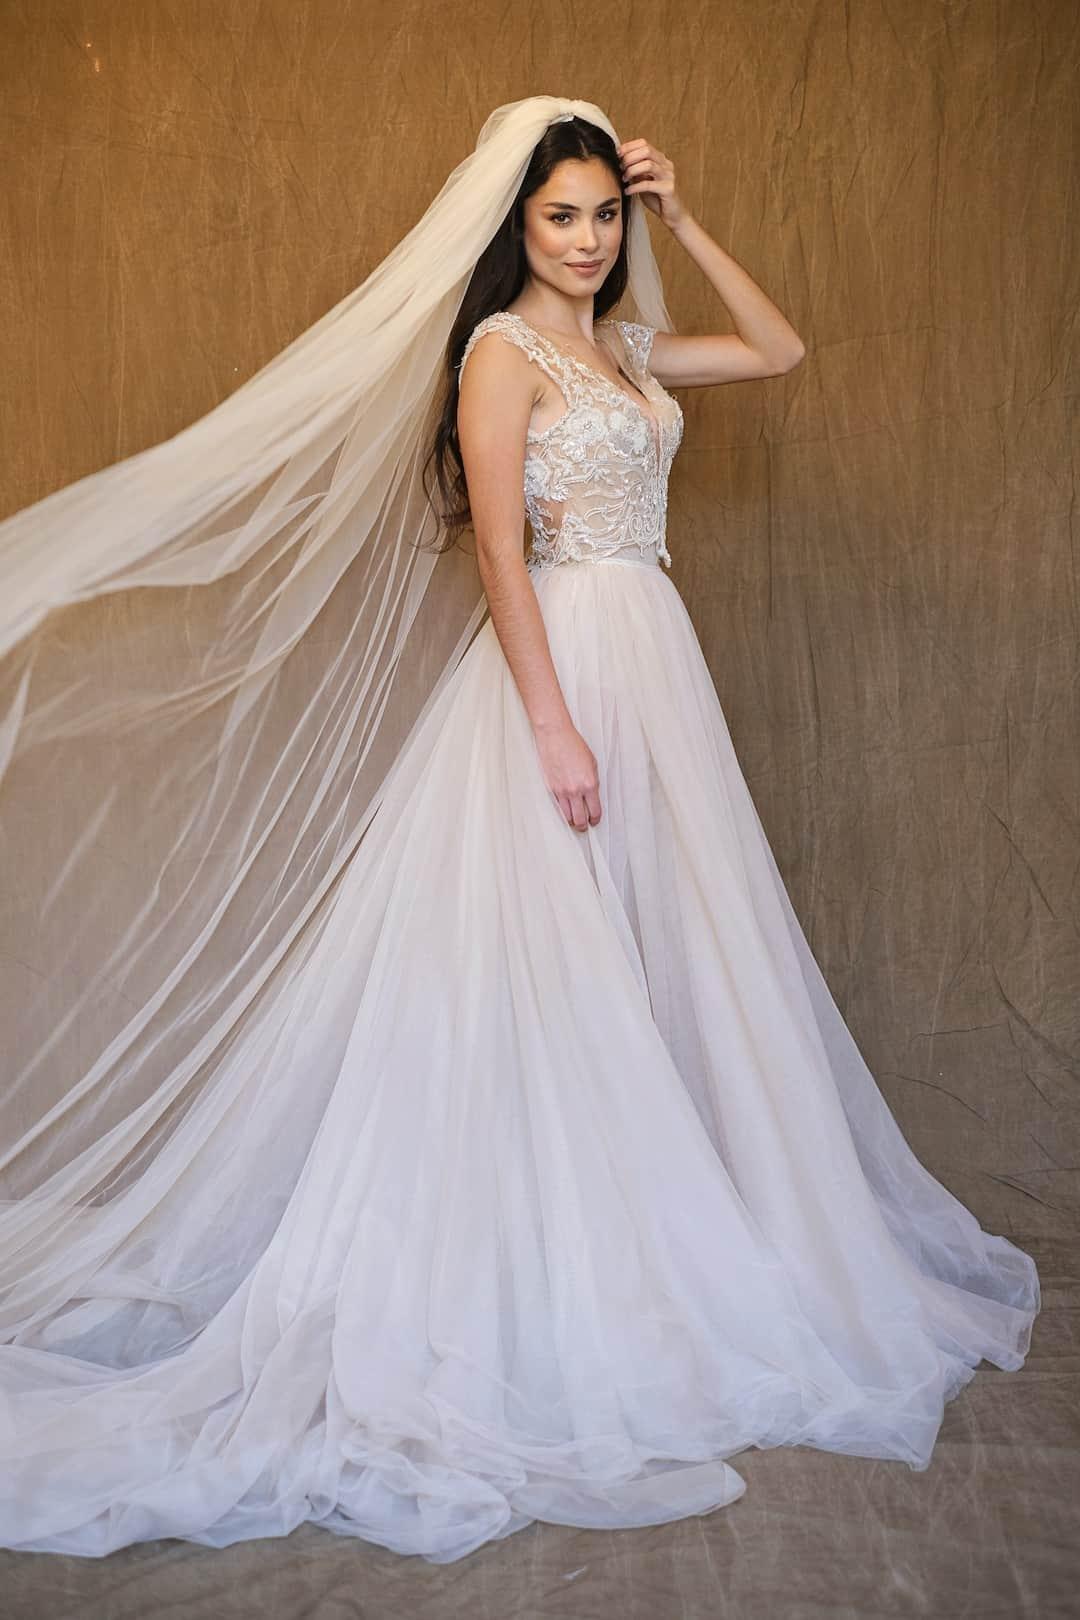 Haute Couture Brautkleider - Galia Lahav - Gala 607 - front